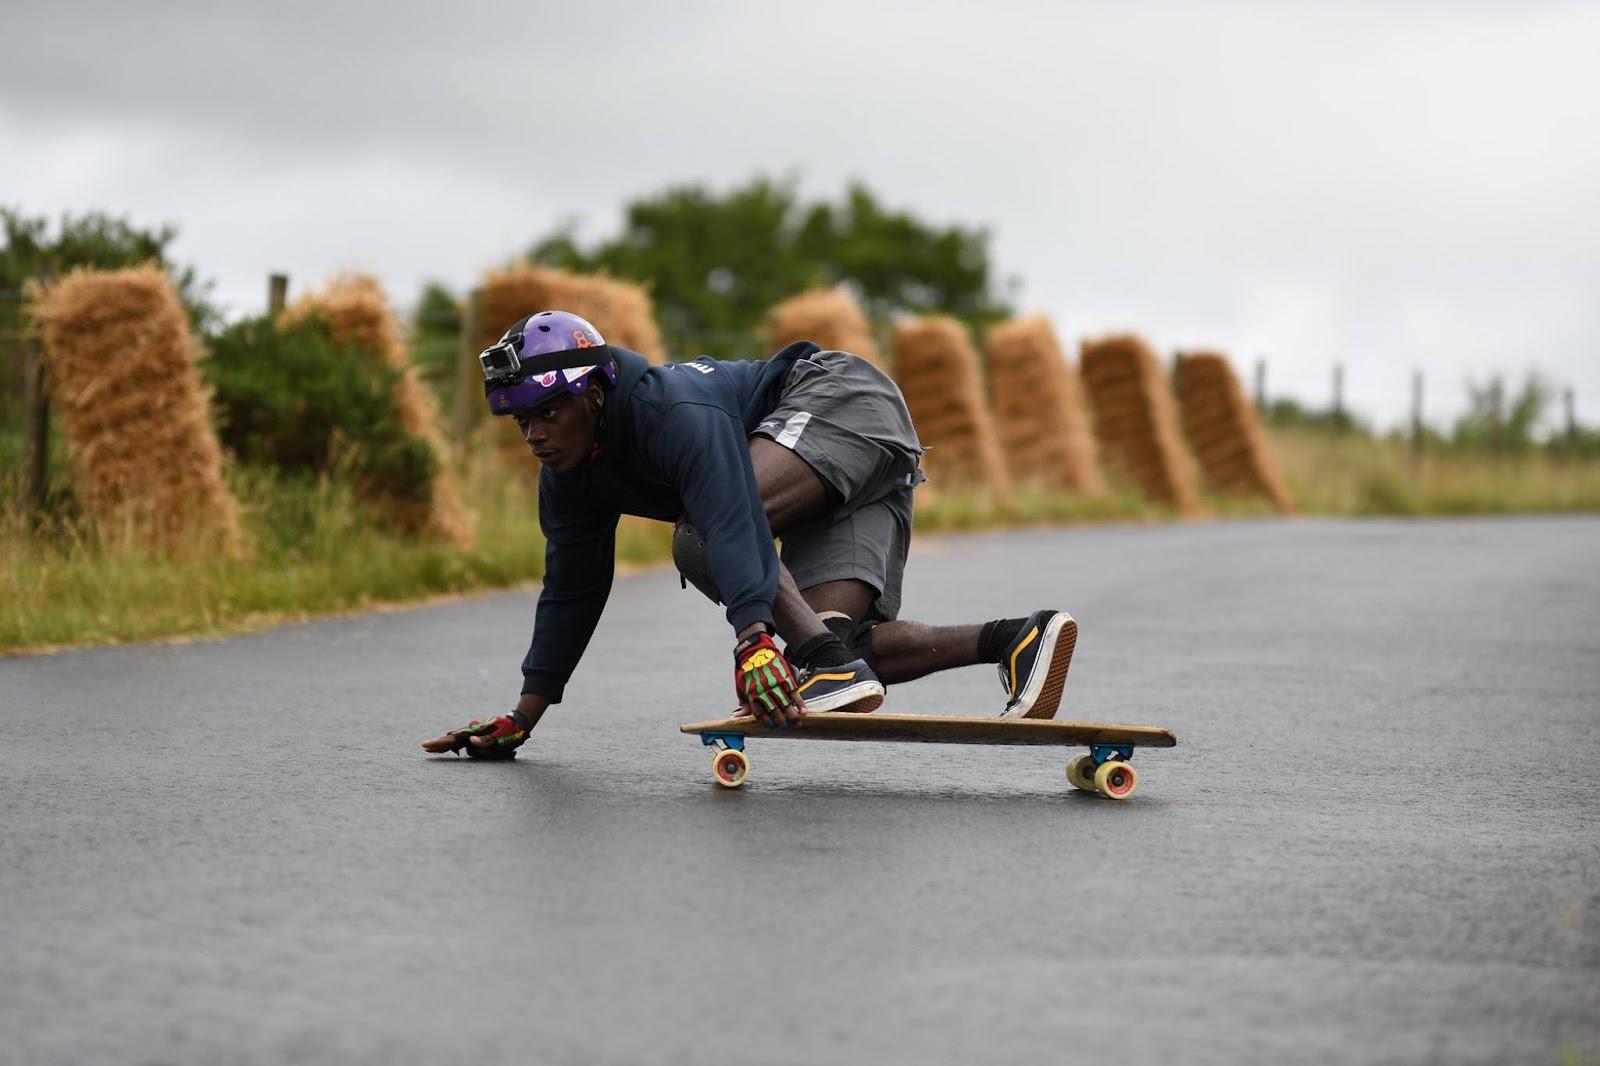 abuga aroni at tregaron freeride riding the sp8boards bullet